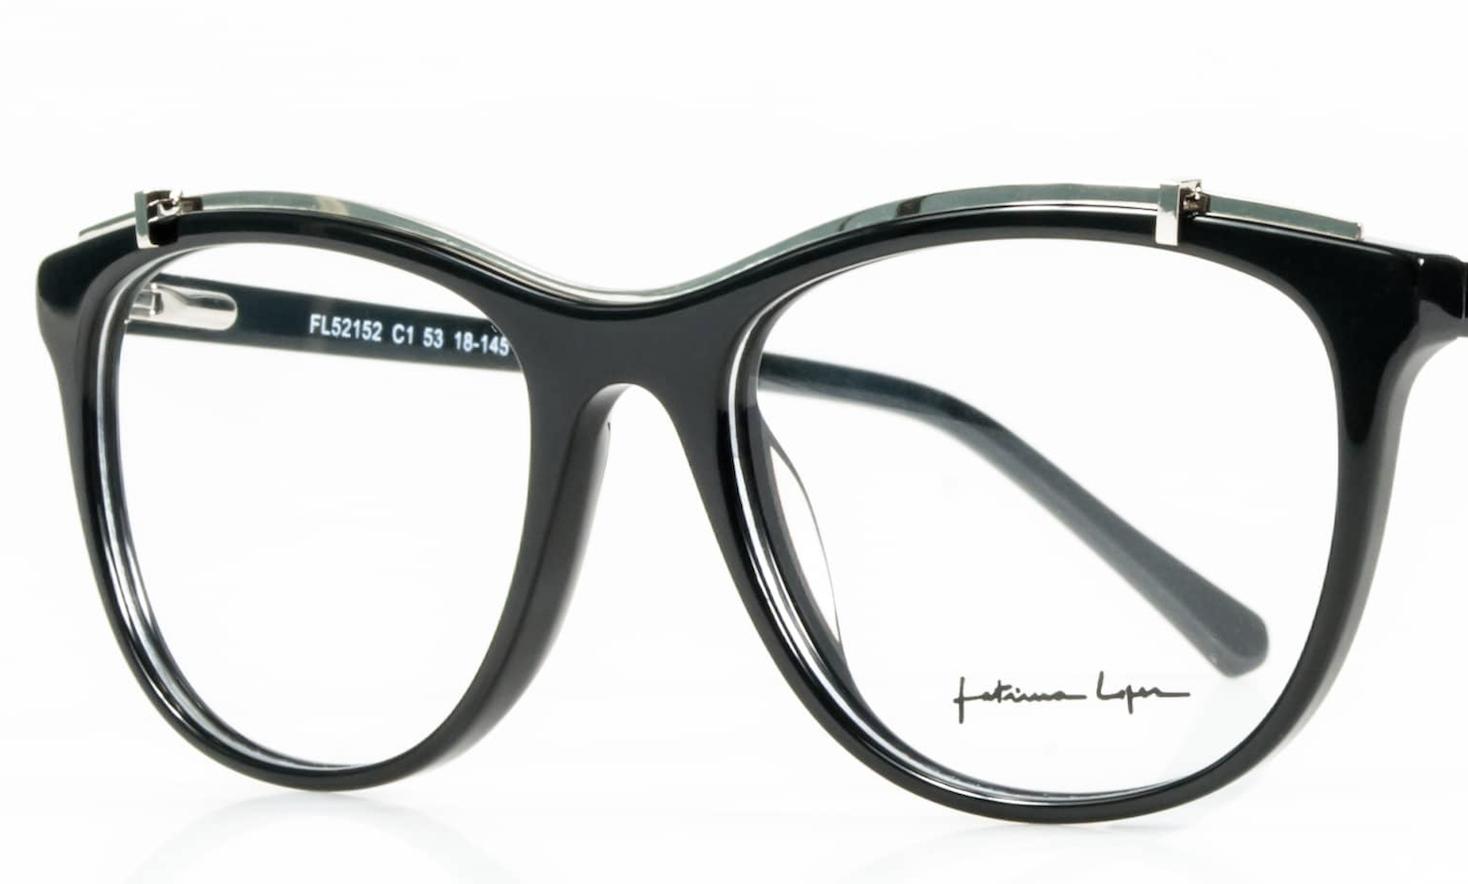 Glasses FL52152 C1 1